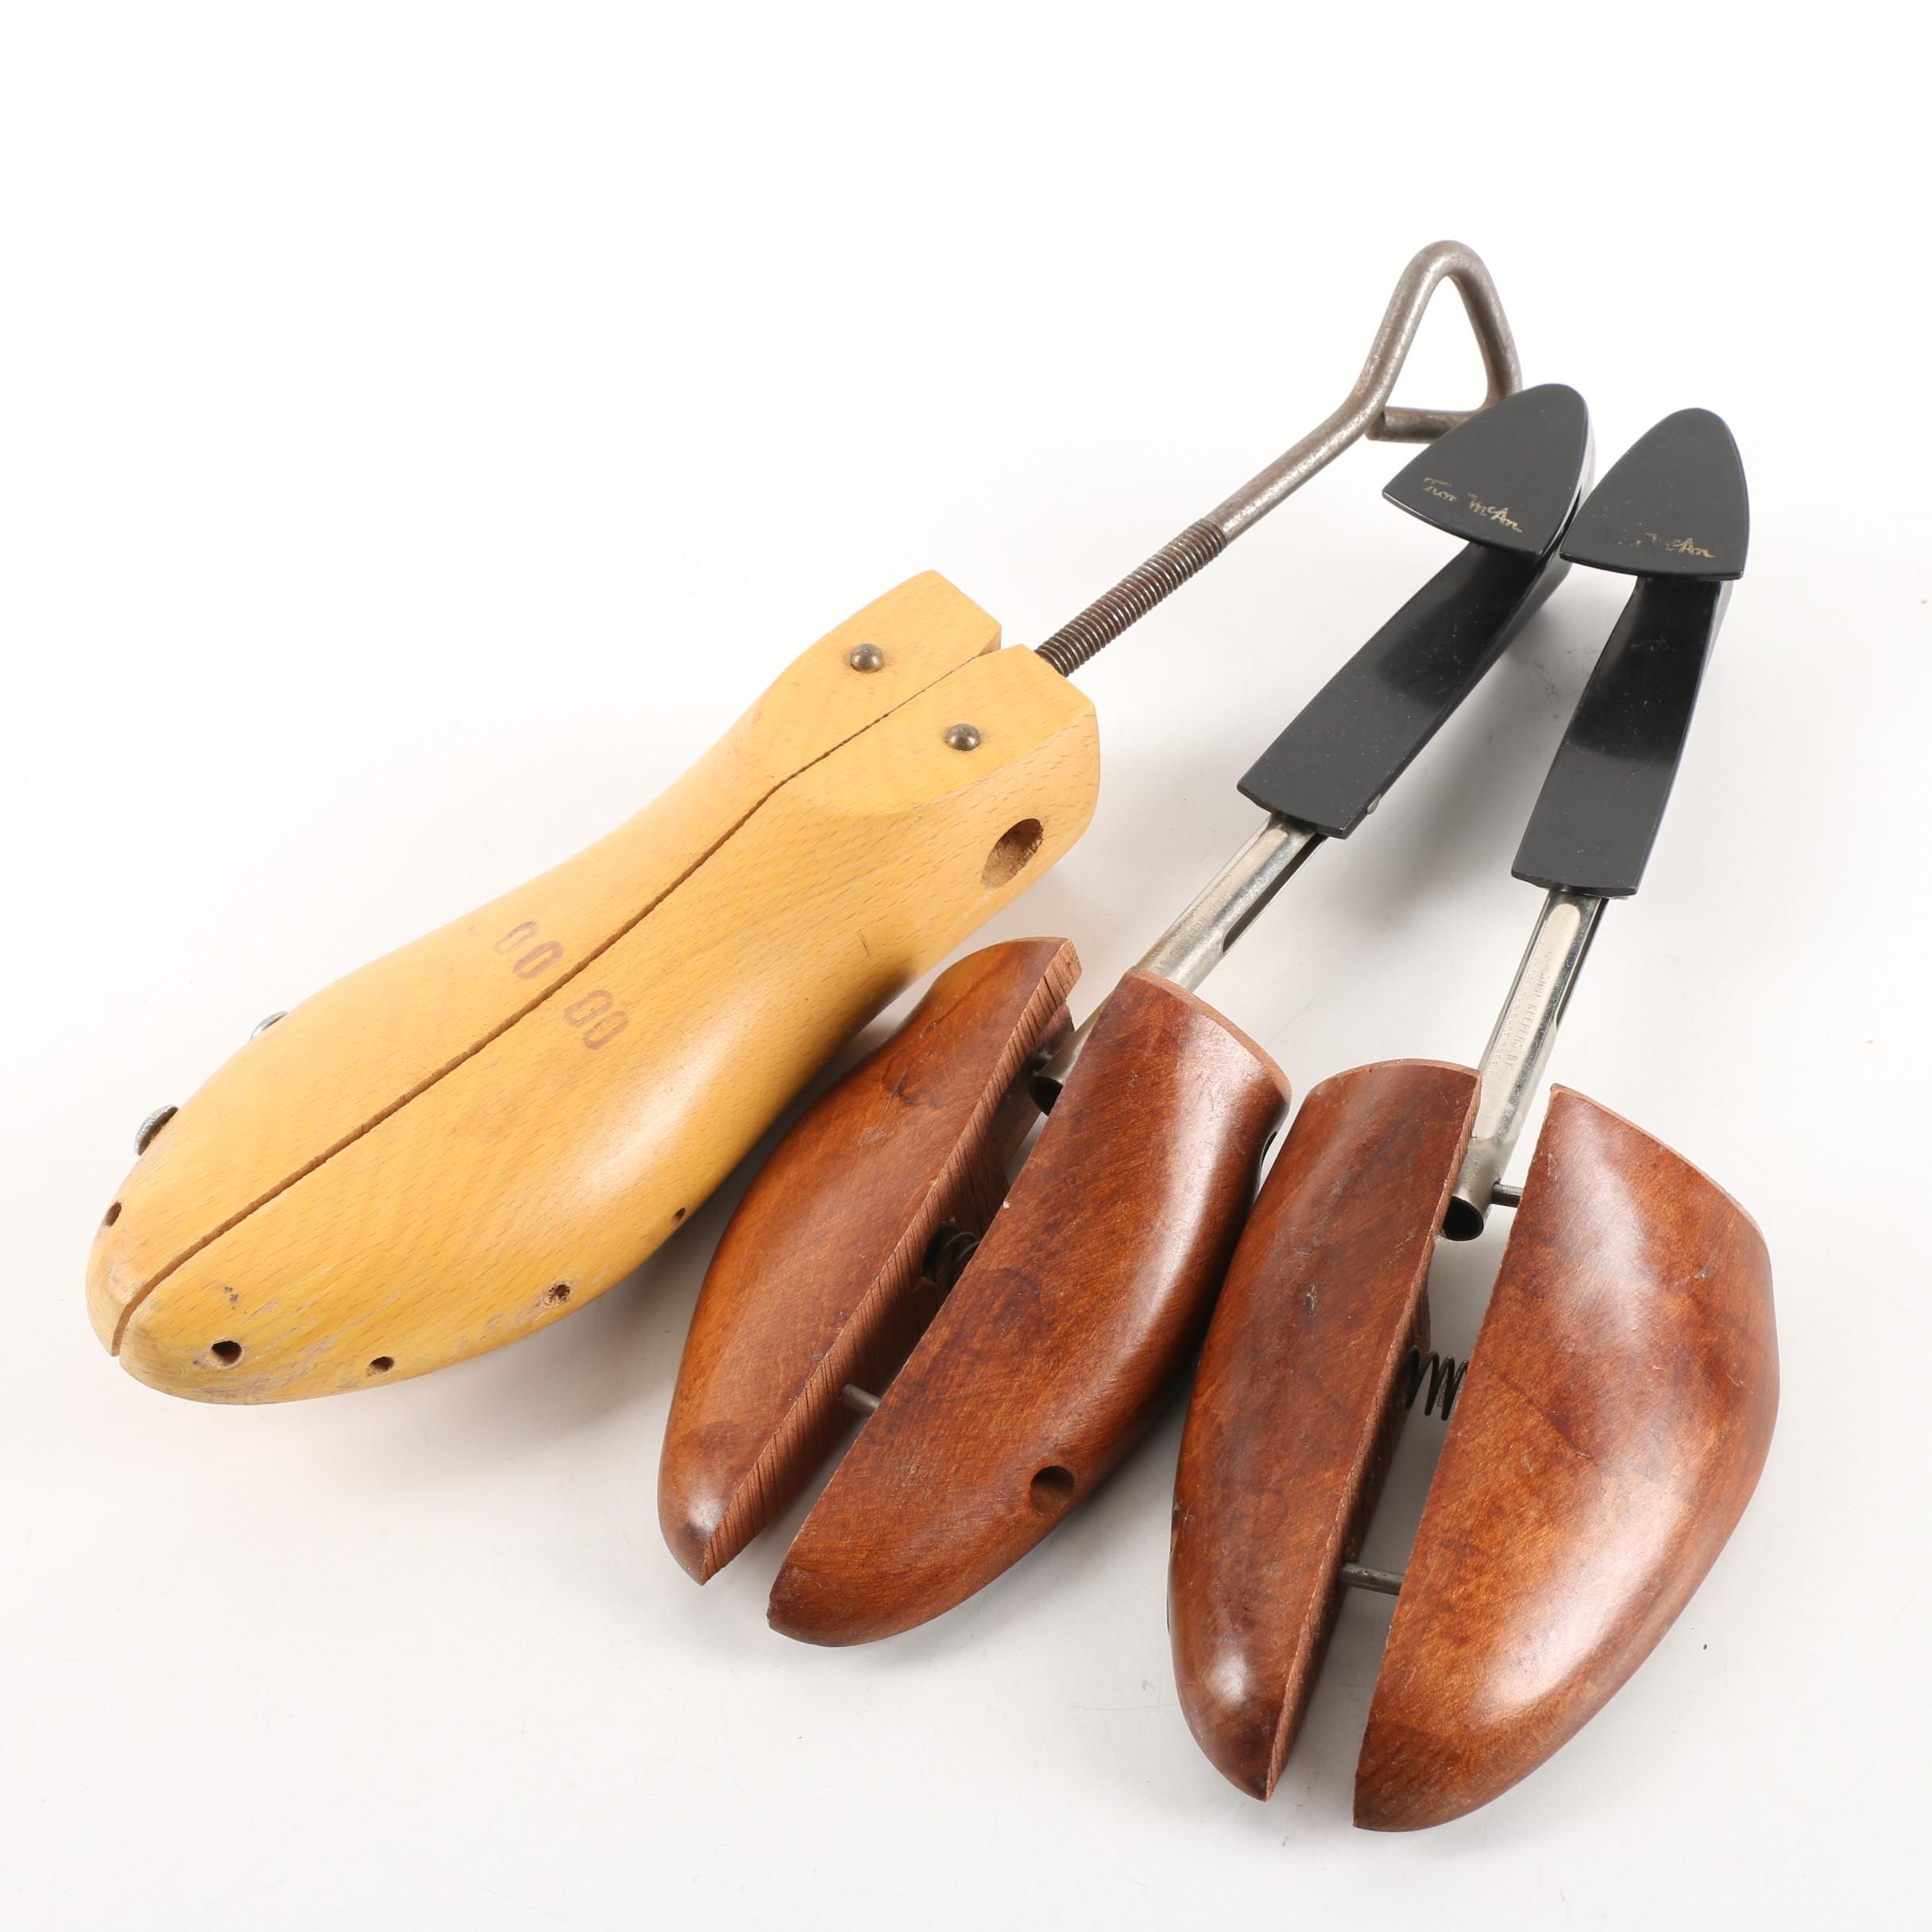 Wooden Shoe Trees